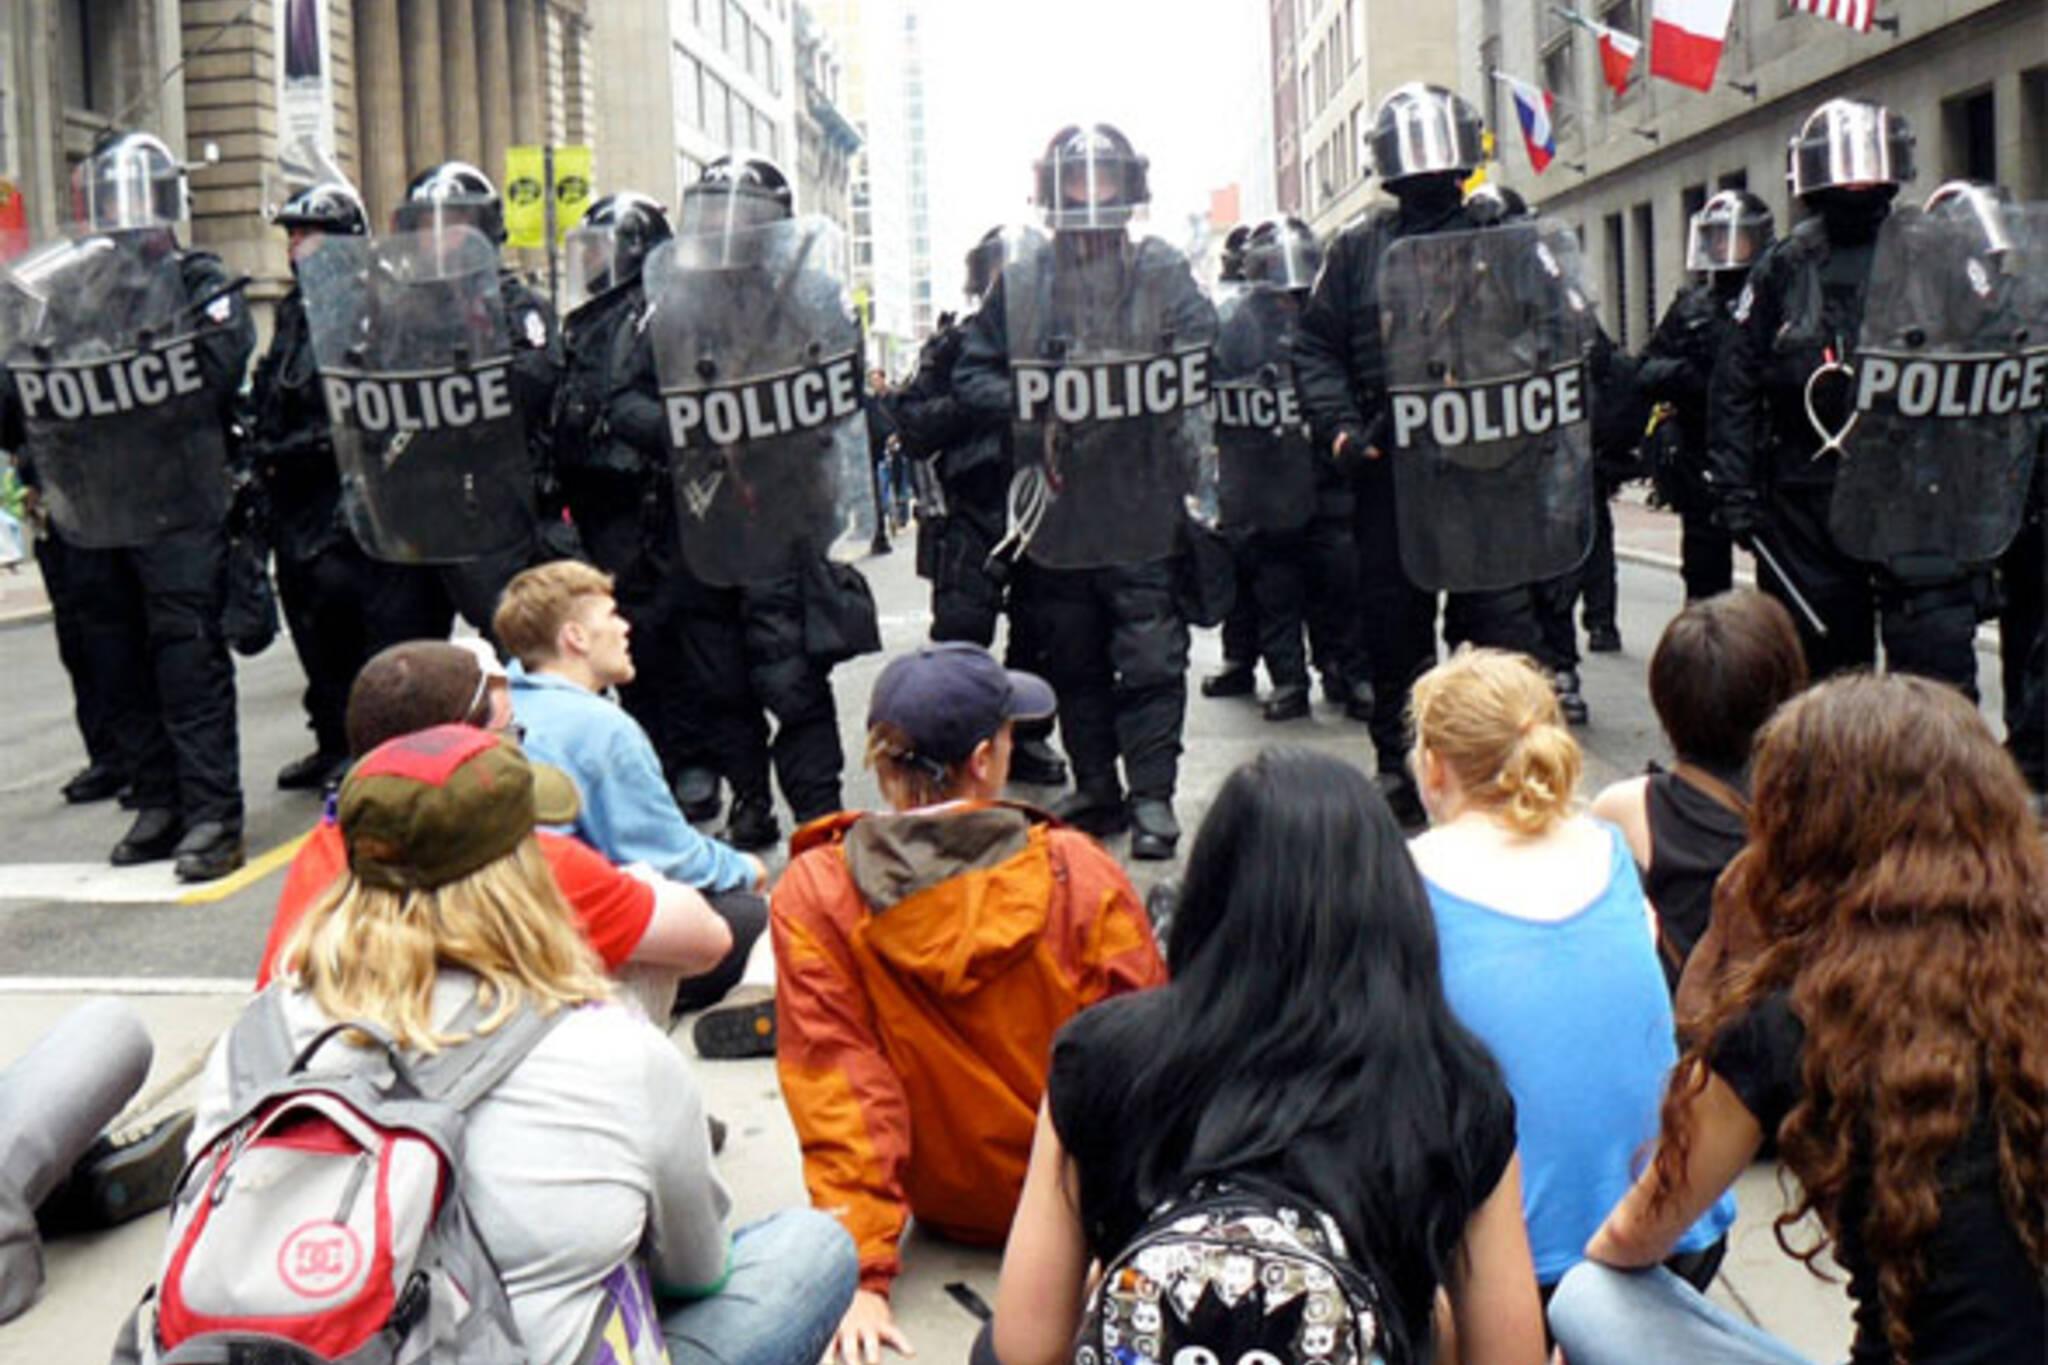 g20 protest videos